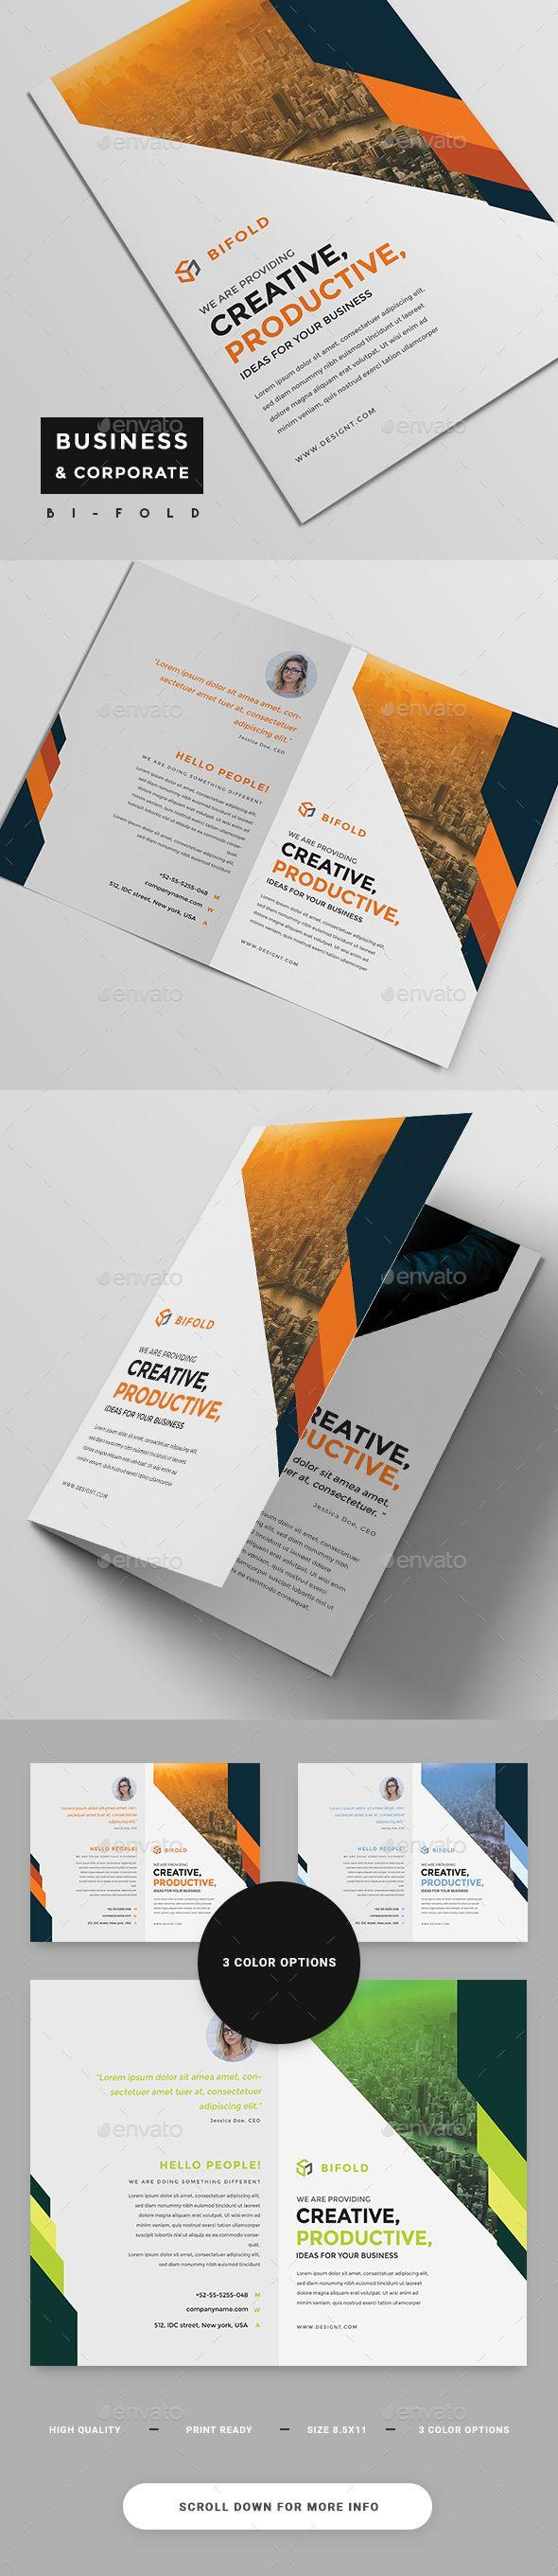 Corporate BiFold Brochure — Photoshop PSD #bi-fold #official • Download ➝ https://graphicriver.net/item/corporate-bifold-brochure/19278955?ref=pxcr